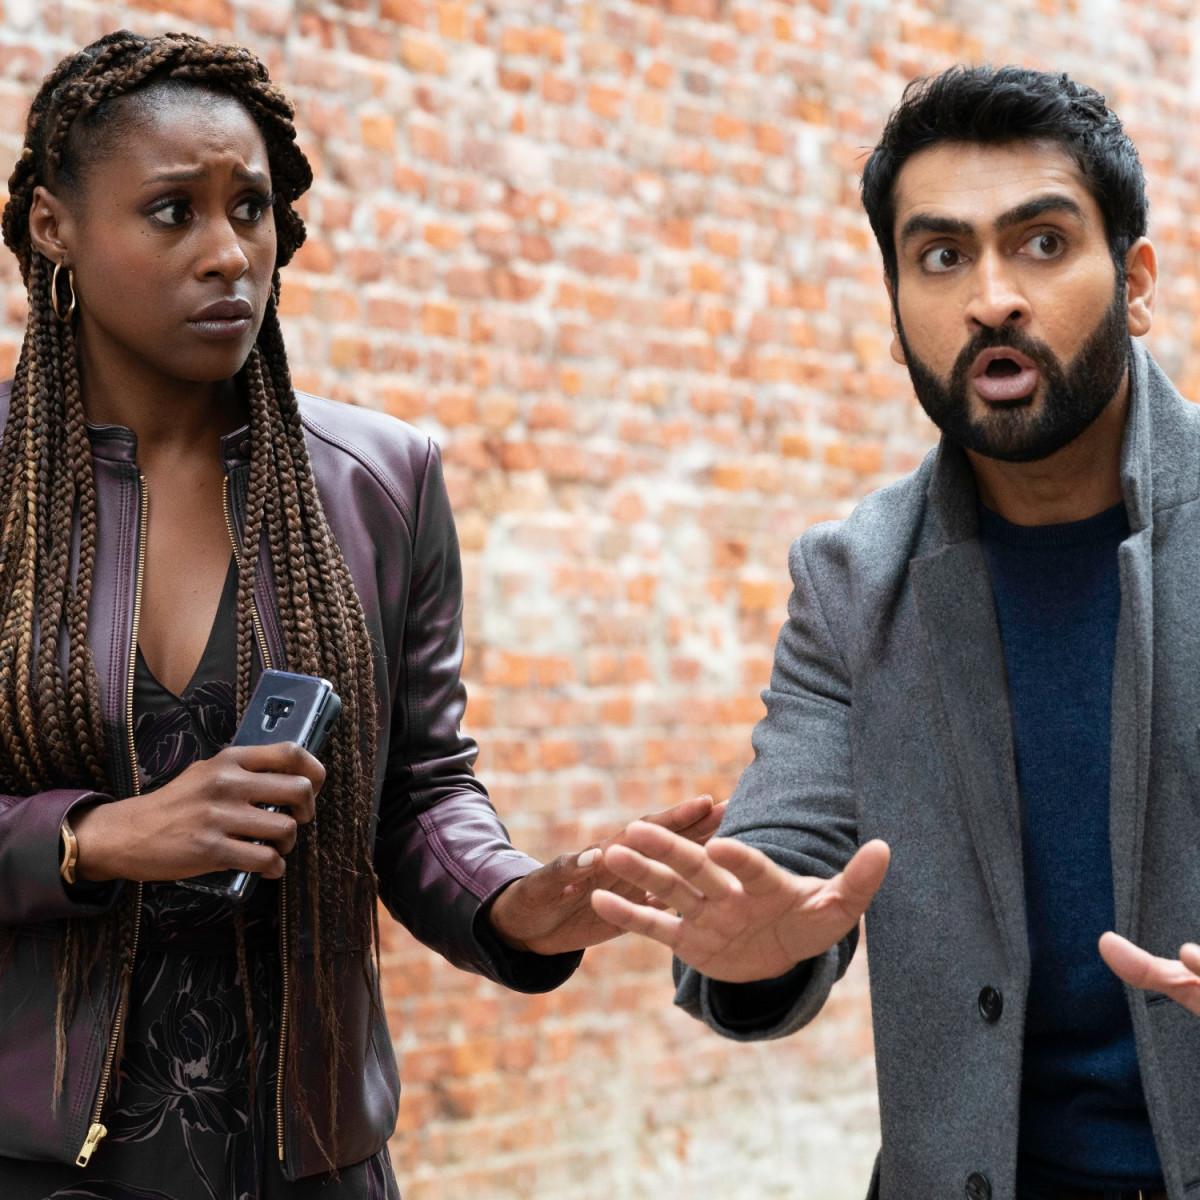 Issa Rae and Kumail Nanjiani in The Lovebirds